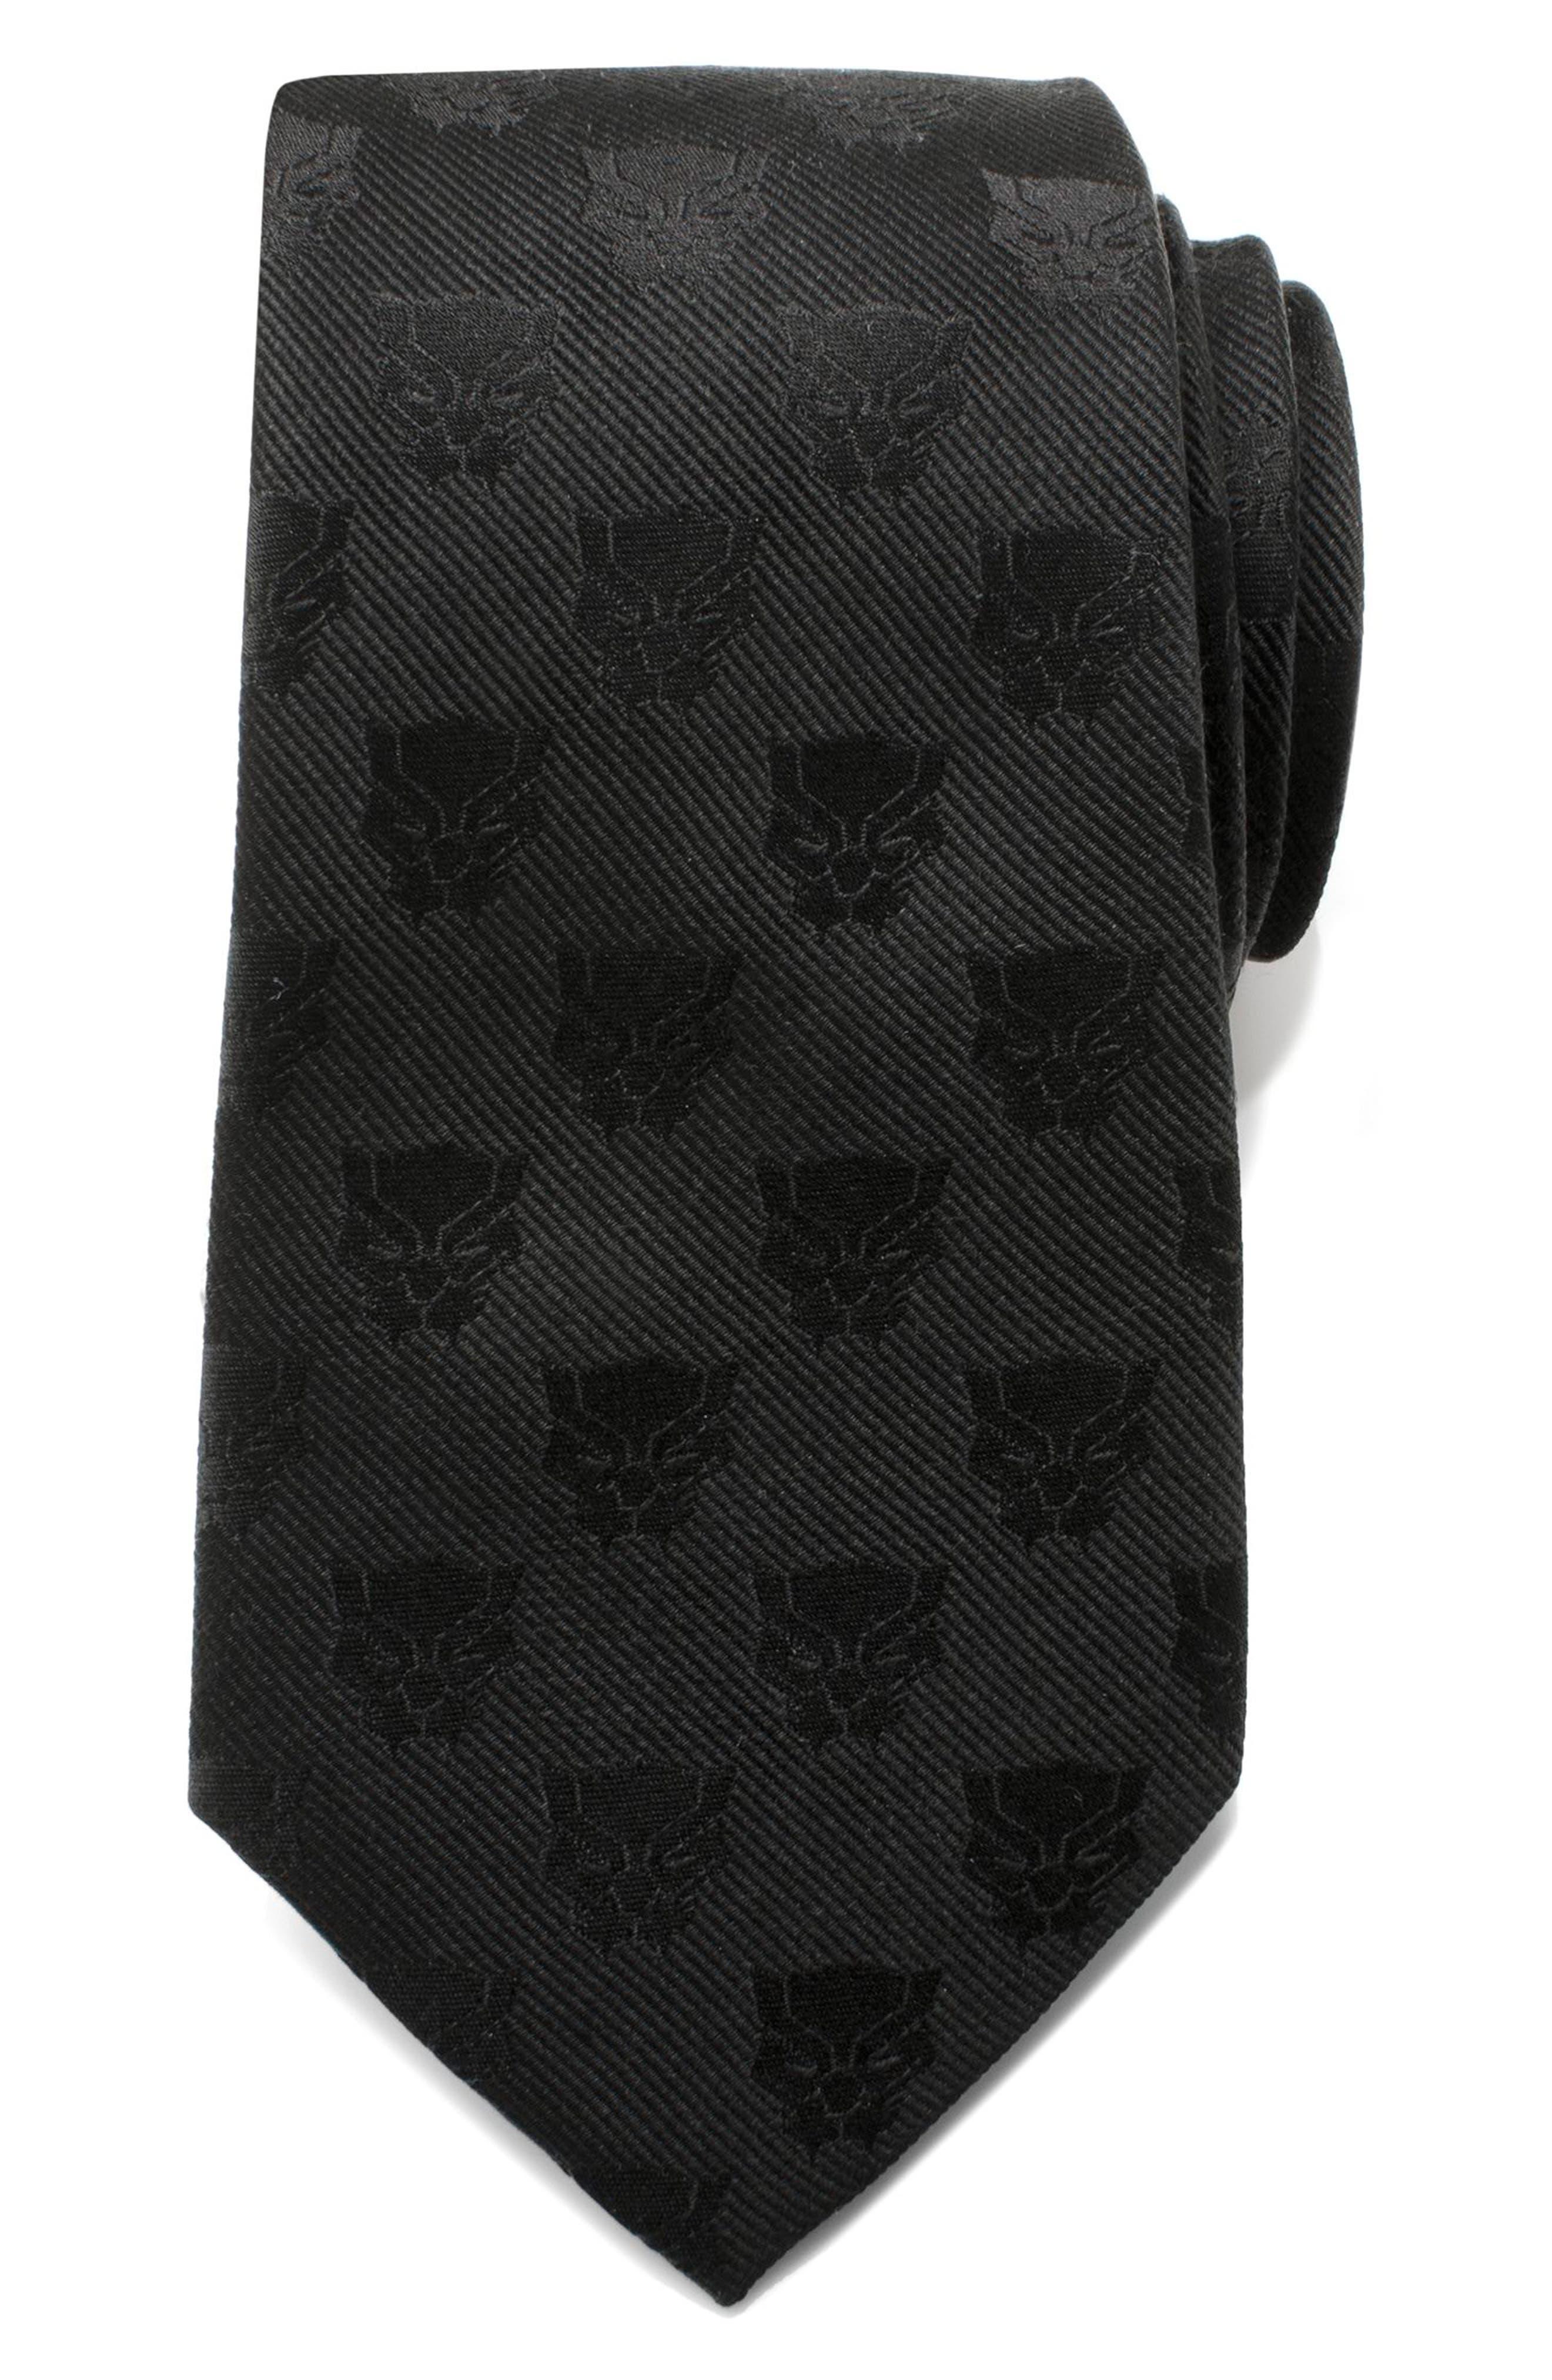 Black Panther Silk Tie,                             Main thumbnail 1, color,                             BLACK